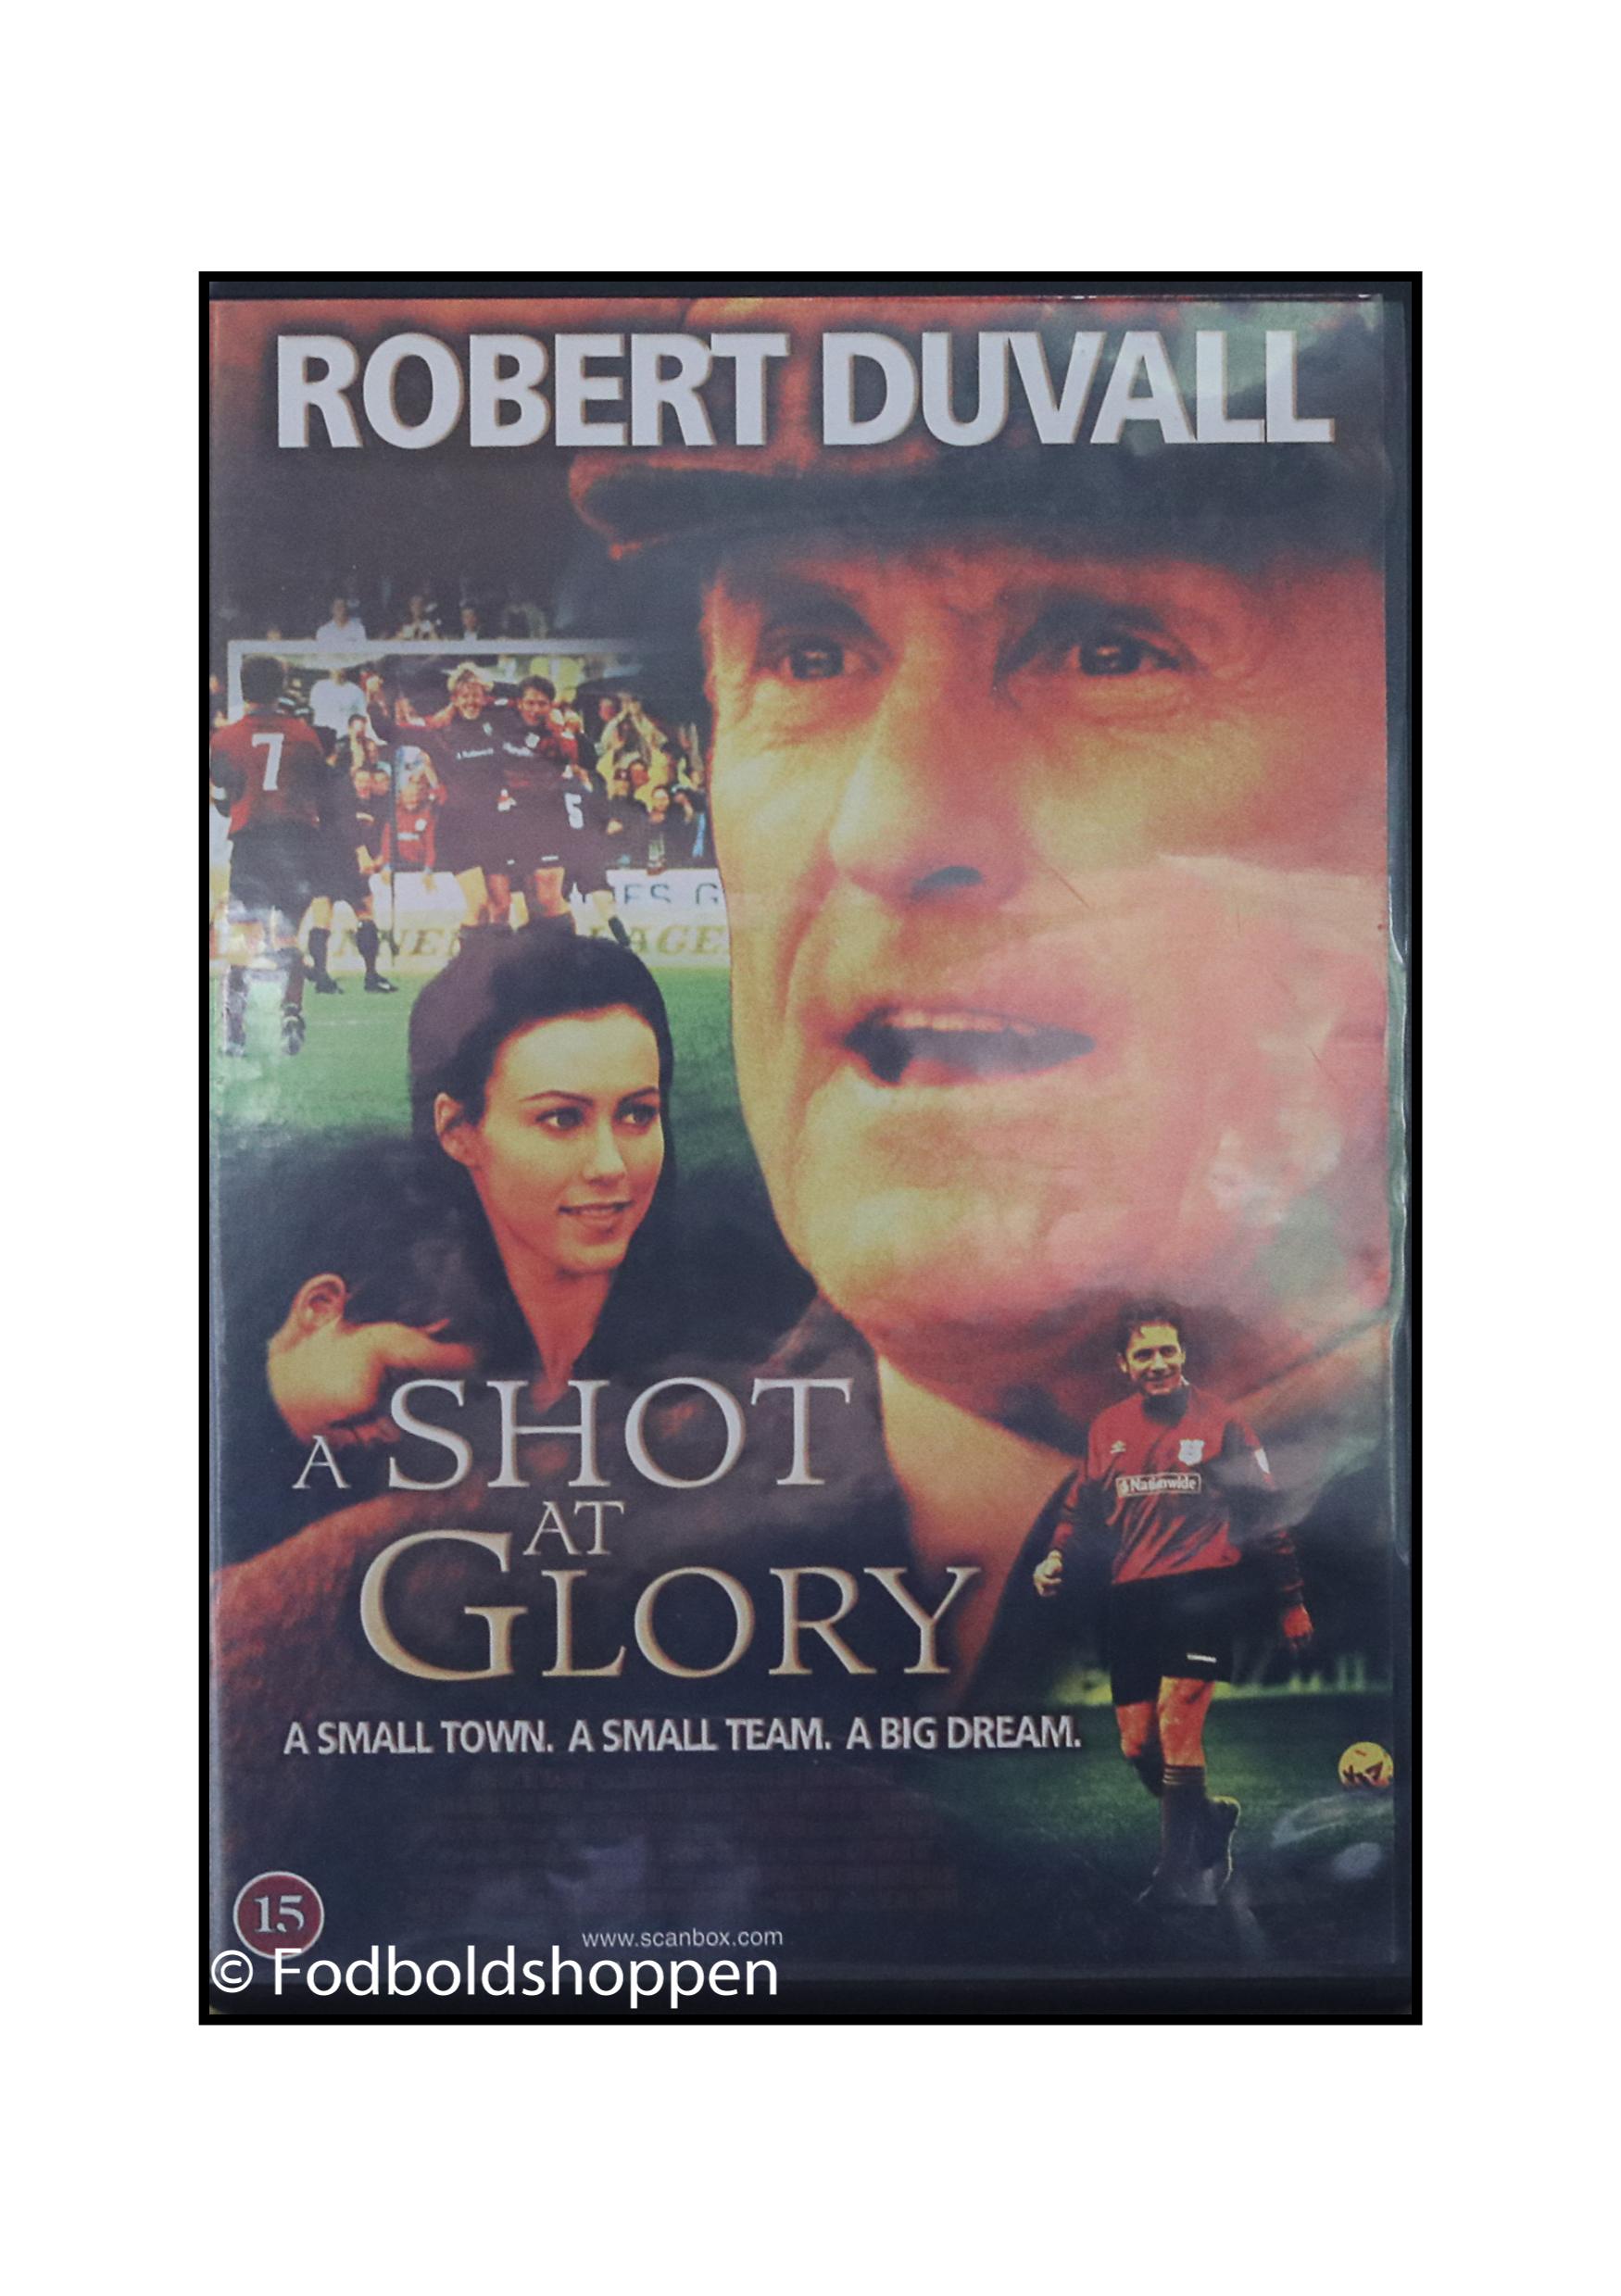 DVD - A SHOT AT GLORY